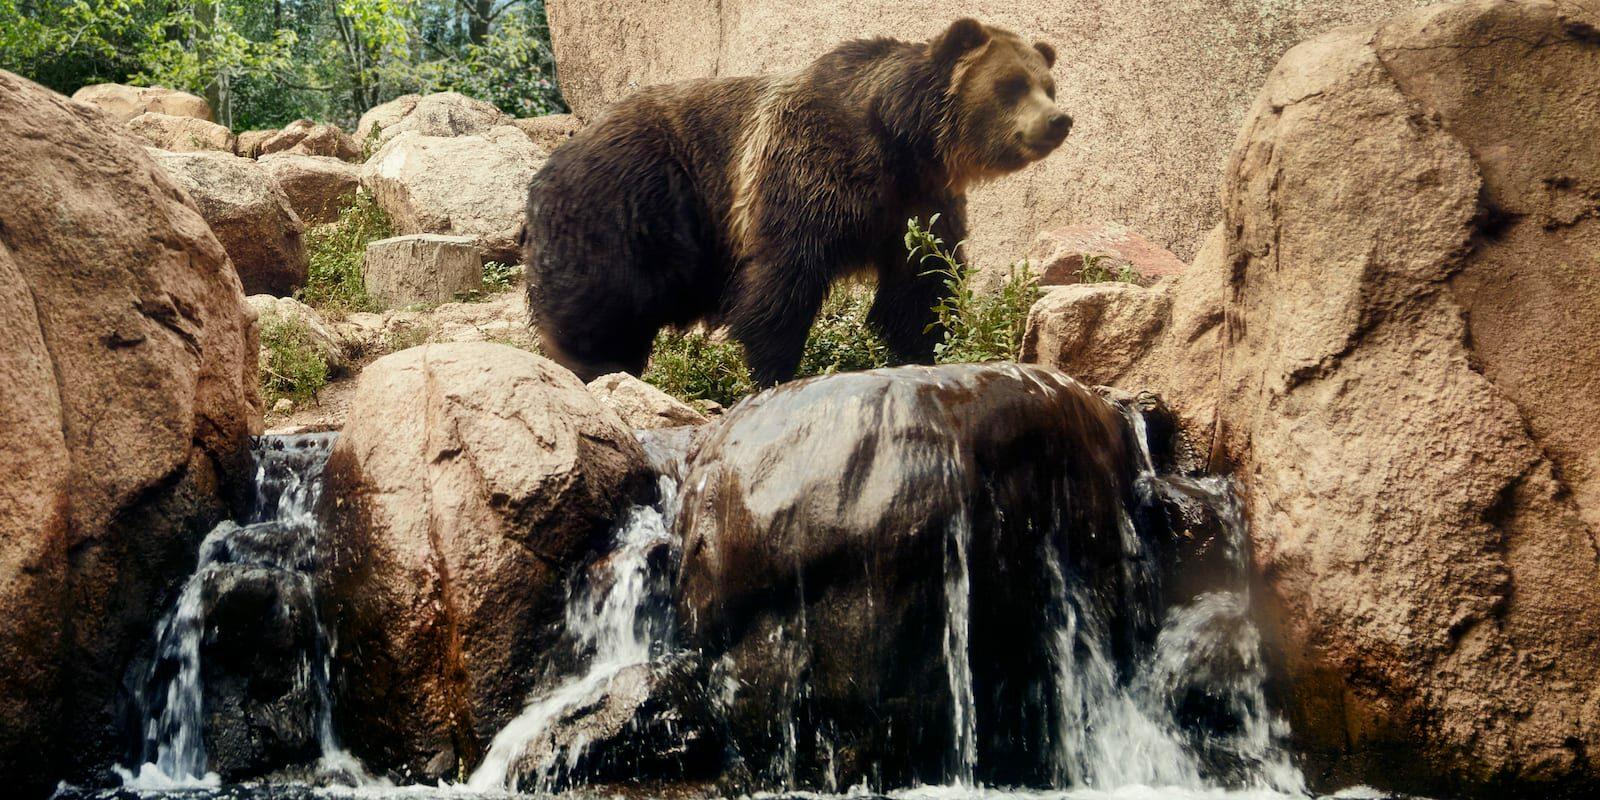 Grizzly Bear Colorado Springs Cheyenne Mountain Zoo